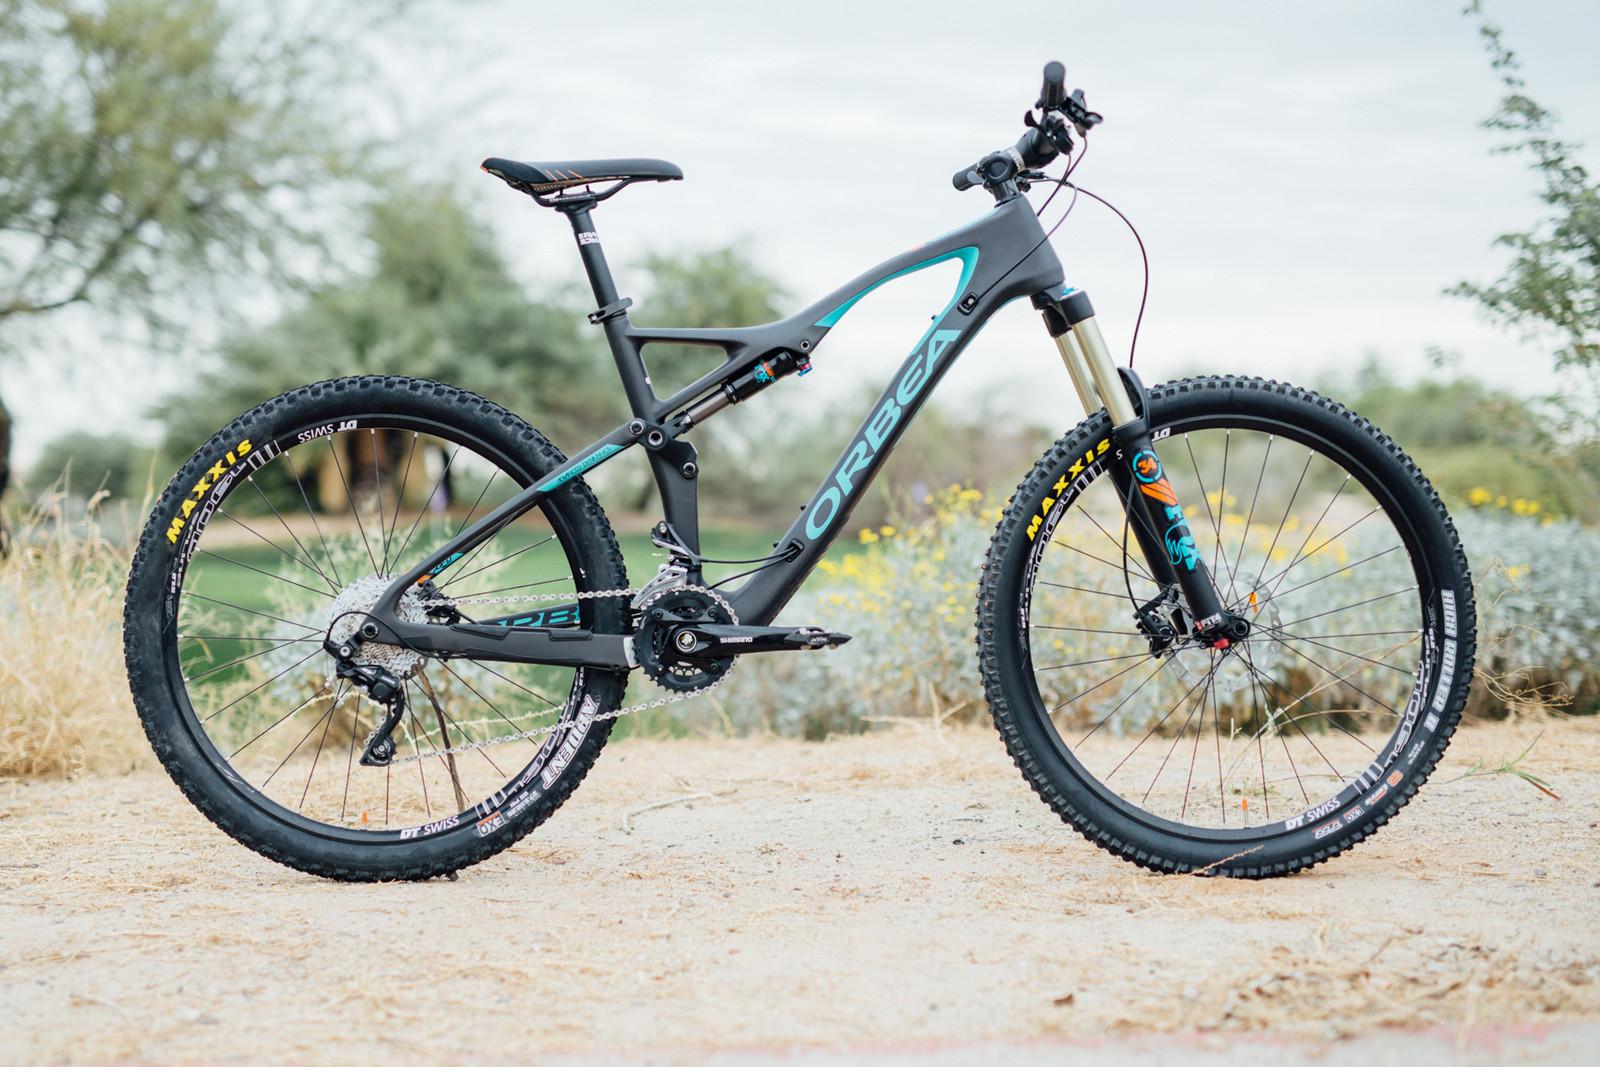 2016 Orbea Occam AM M30 - 17 Bikes Tested - 2016 Vital MTB Test Sessions - Mountain Biking Pictures - Vital MTB